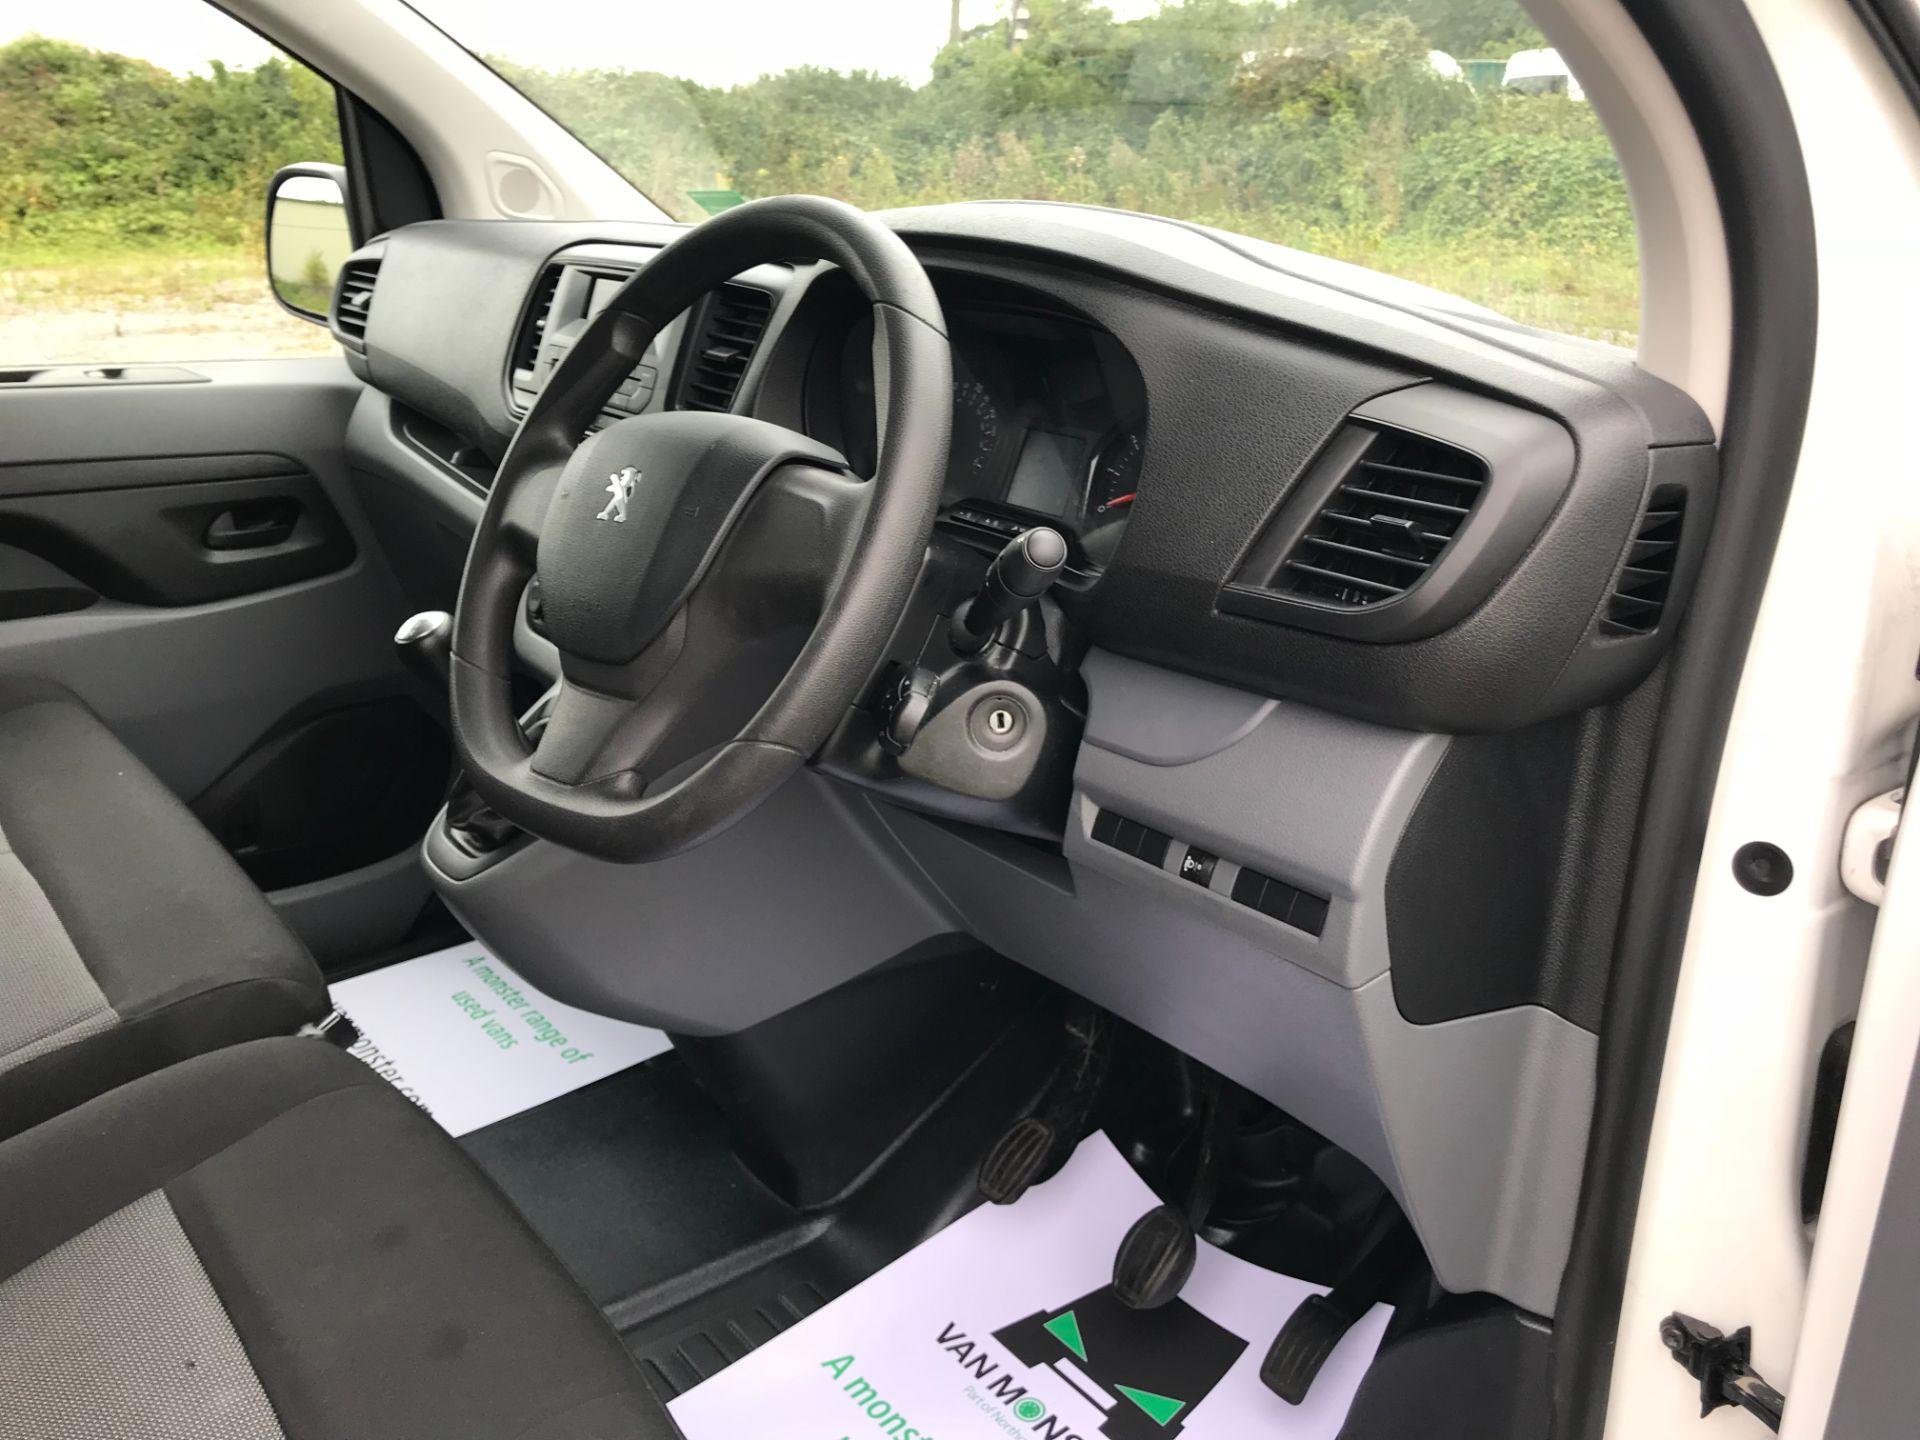 2018 Peugeot Expert  STANDARD 1000 1.6 BLUEHDI 95 S EURO 6 (NU18KFJ) Image 27